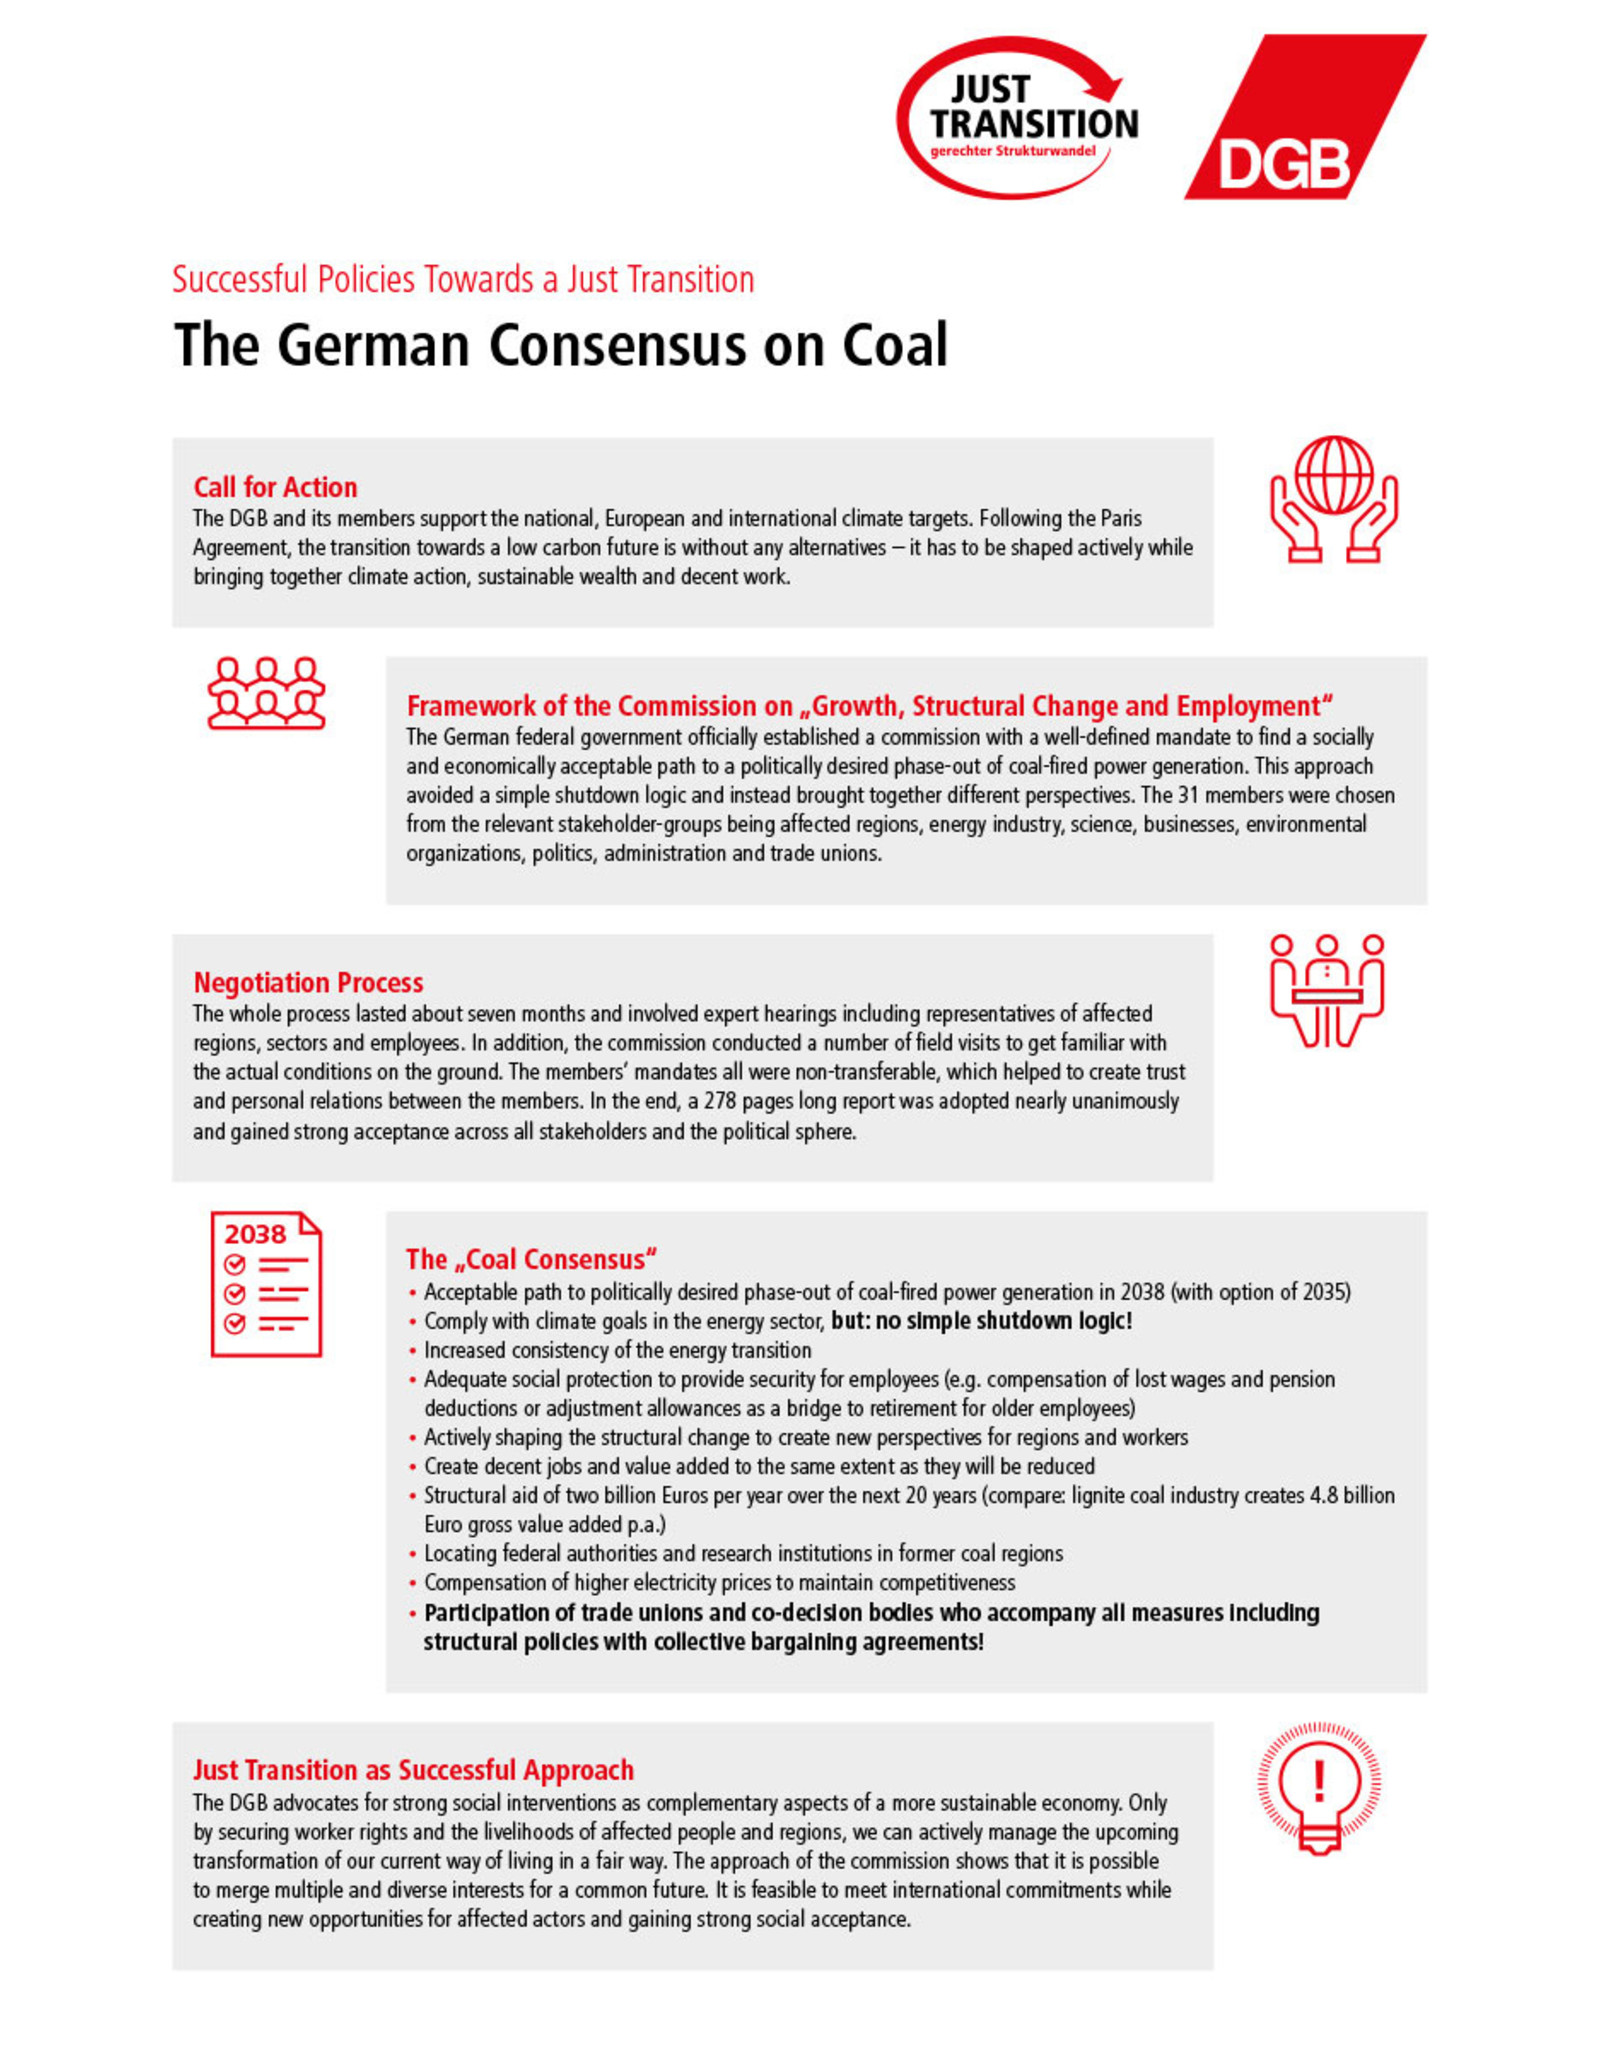 The German Consensus on Coal